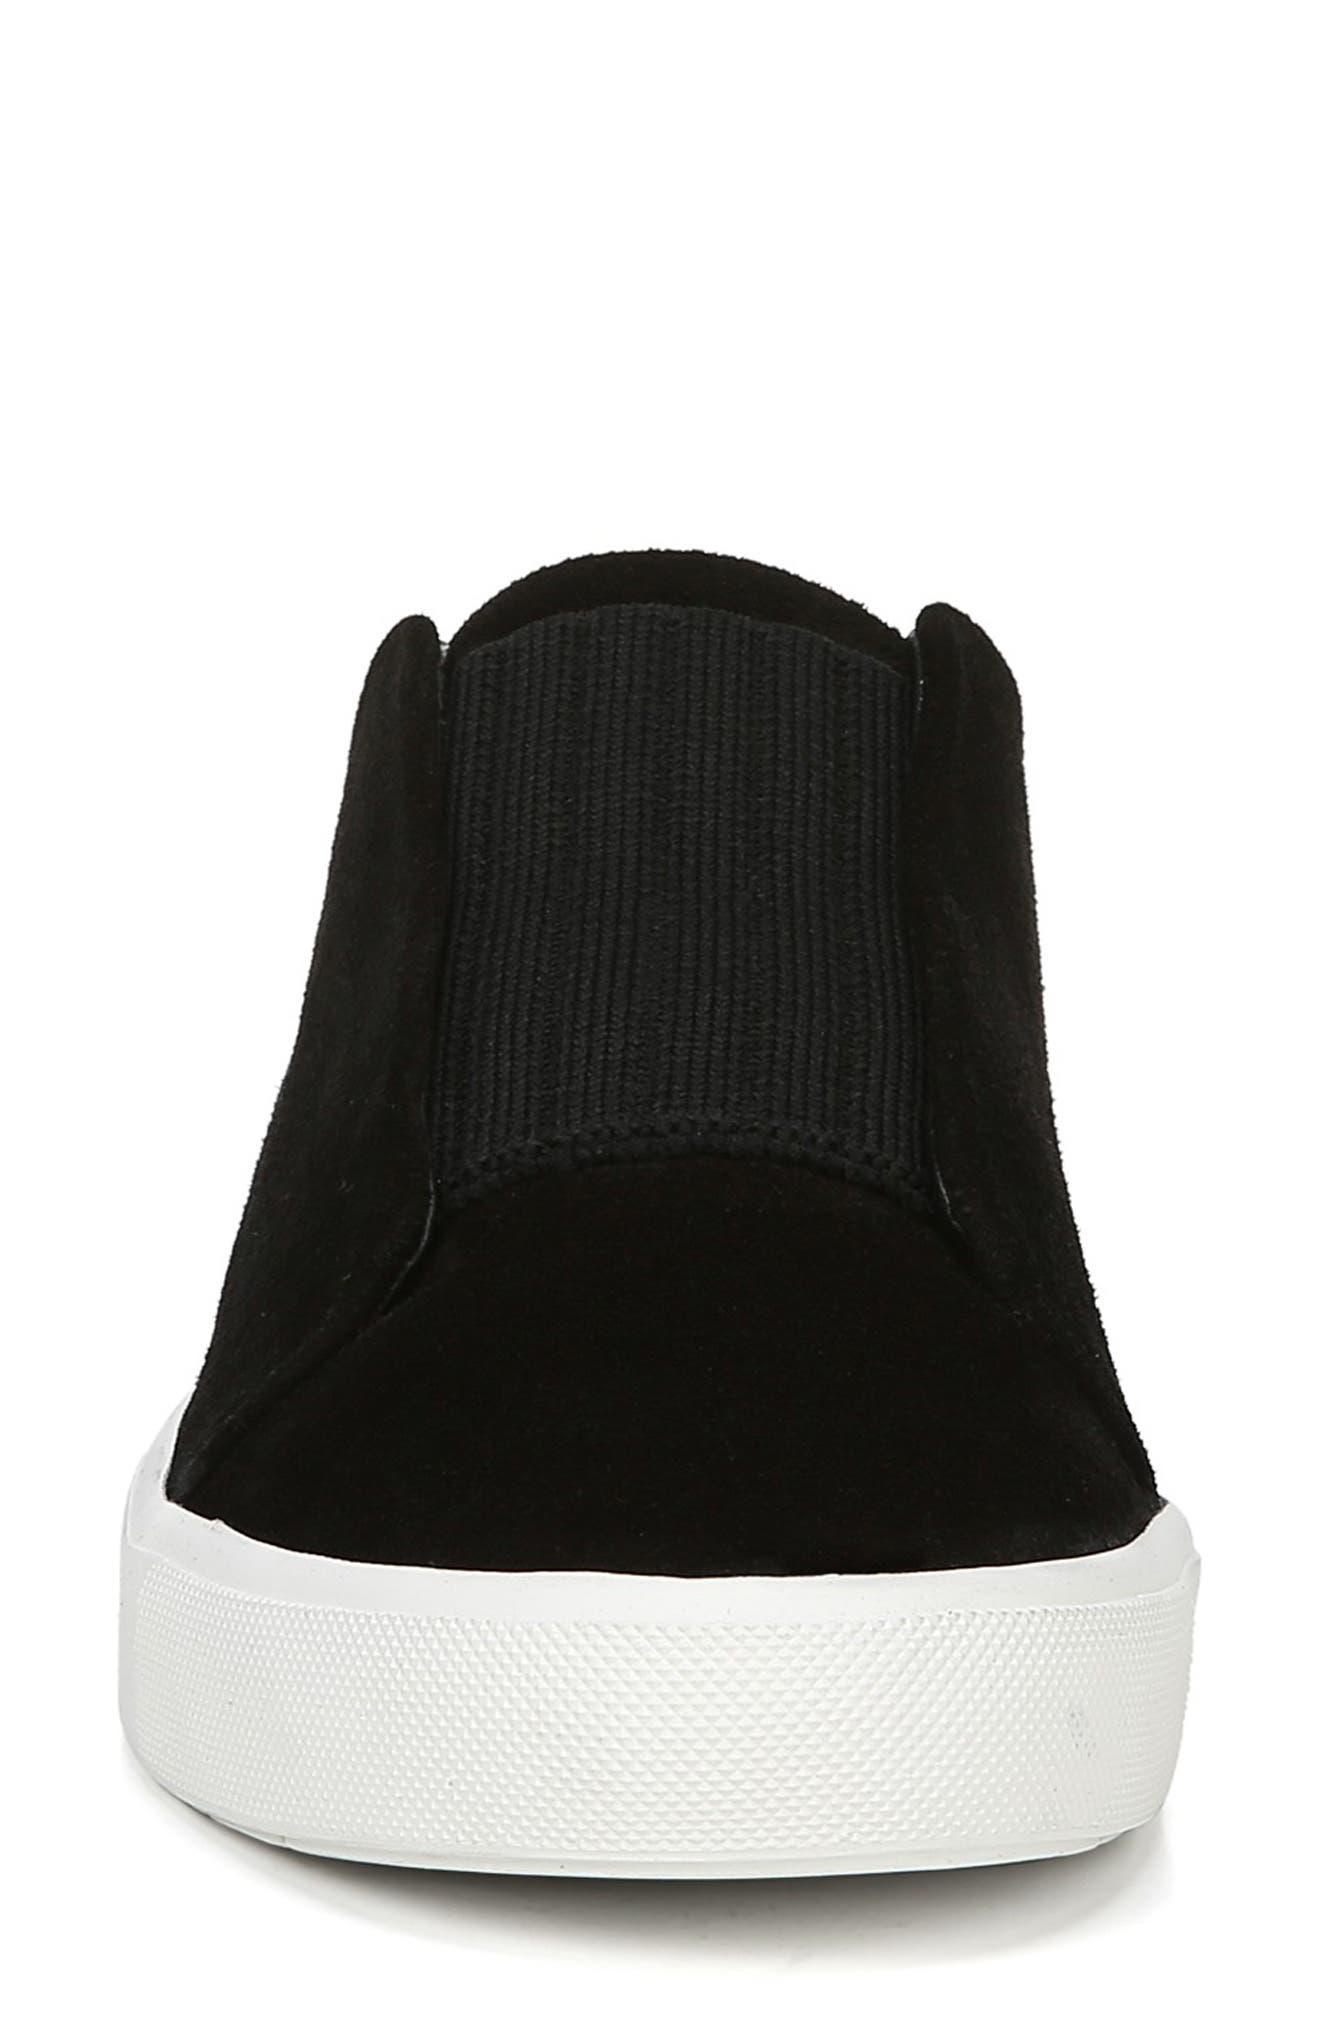 Cantara Slip-On Sneaker,                             Alternate thumbnail 4, color,                             BLACK SUEDE